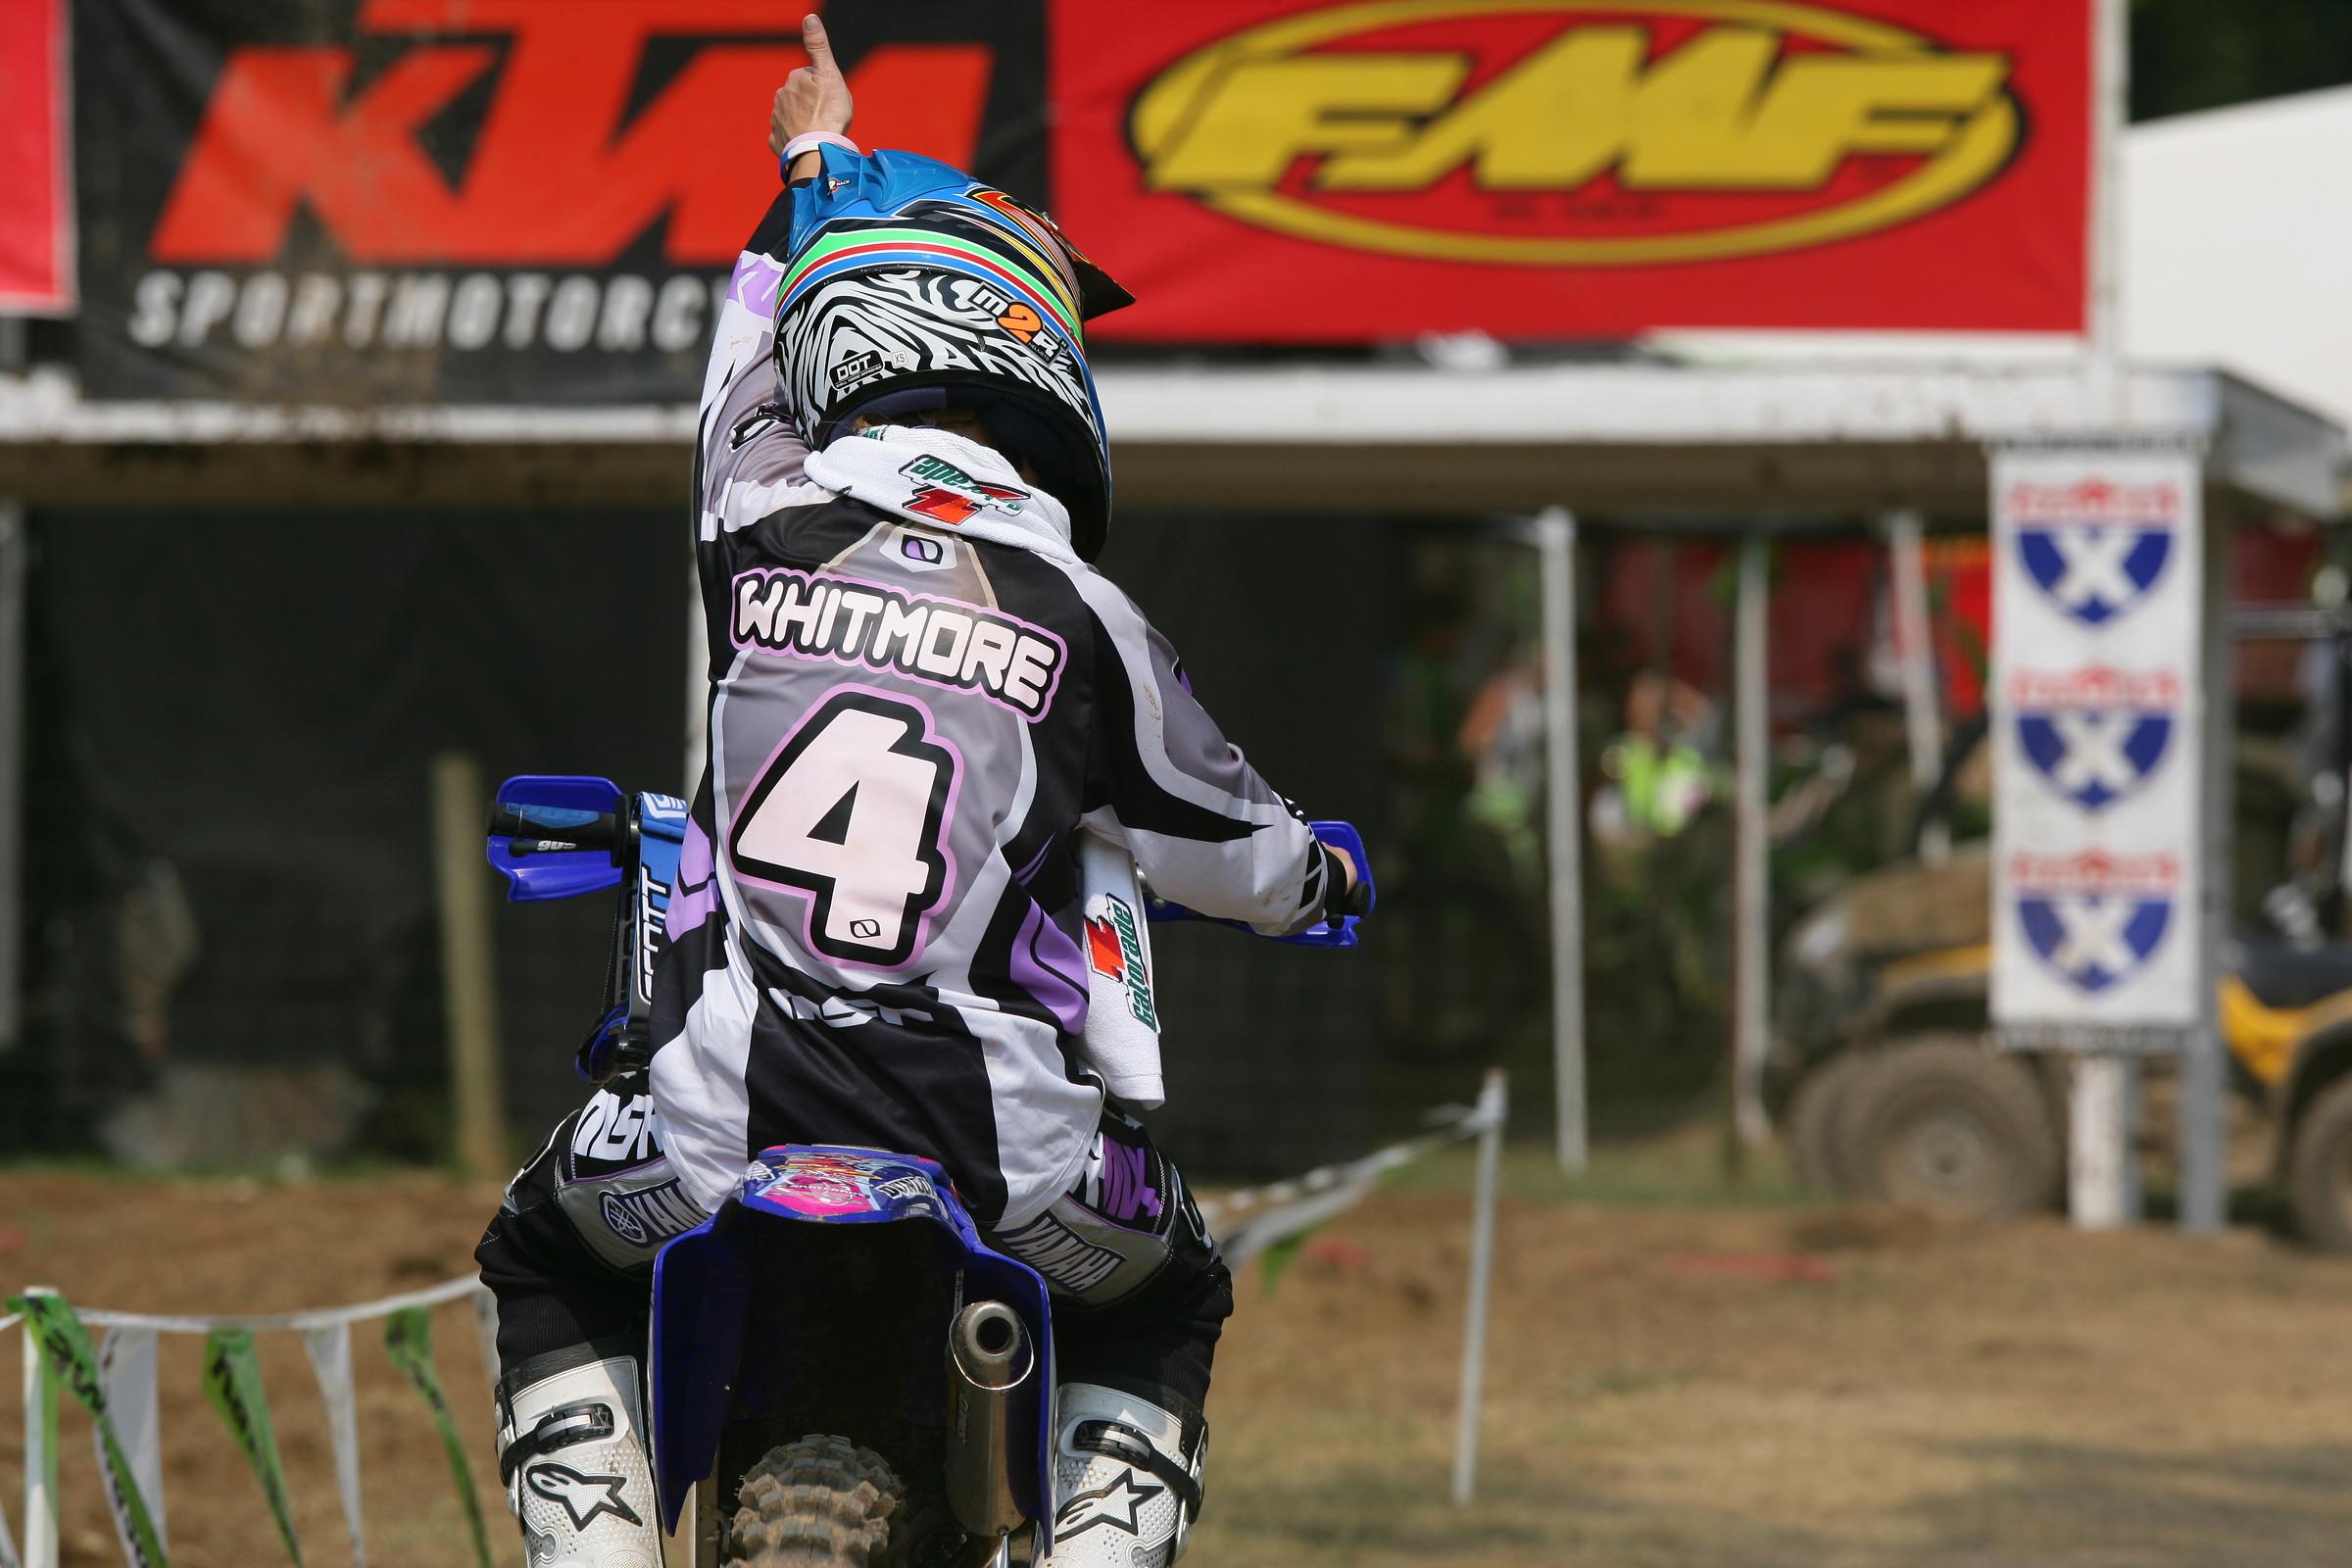 Dating Woman Motocross